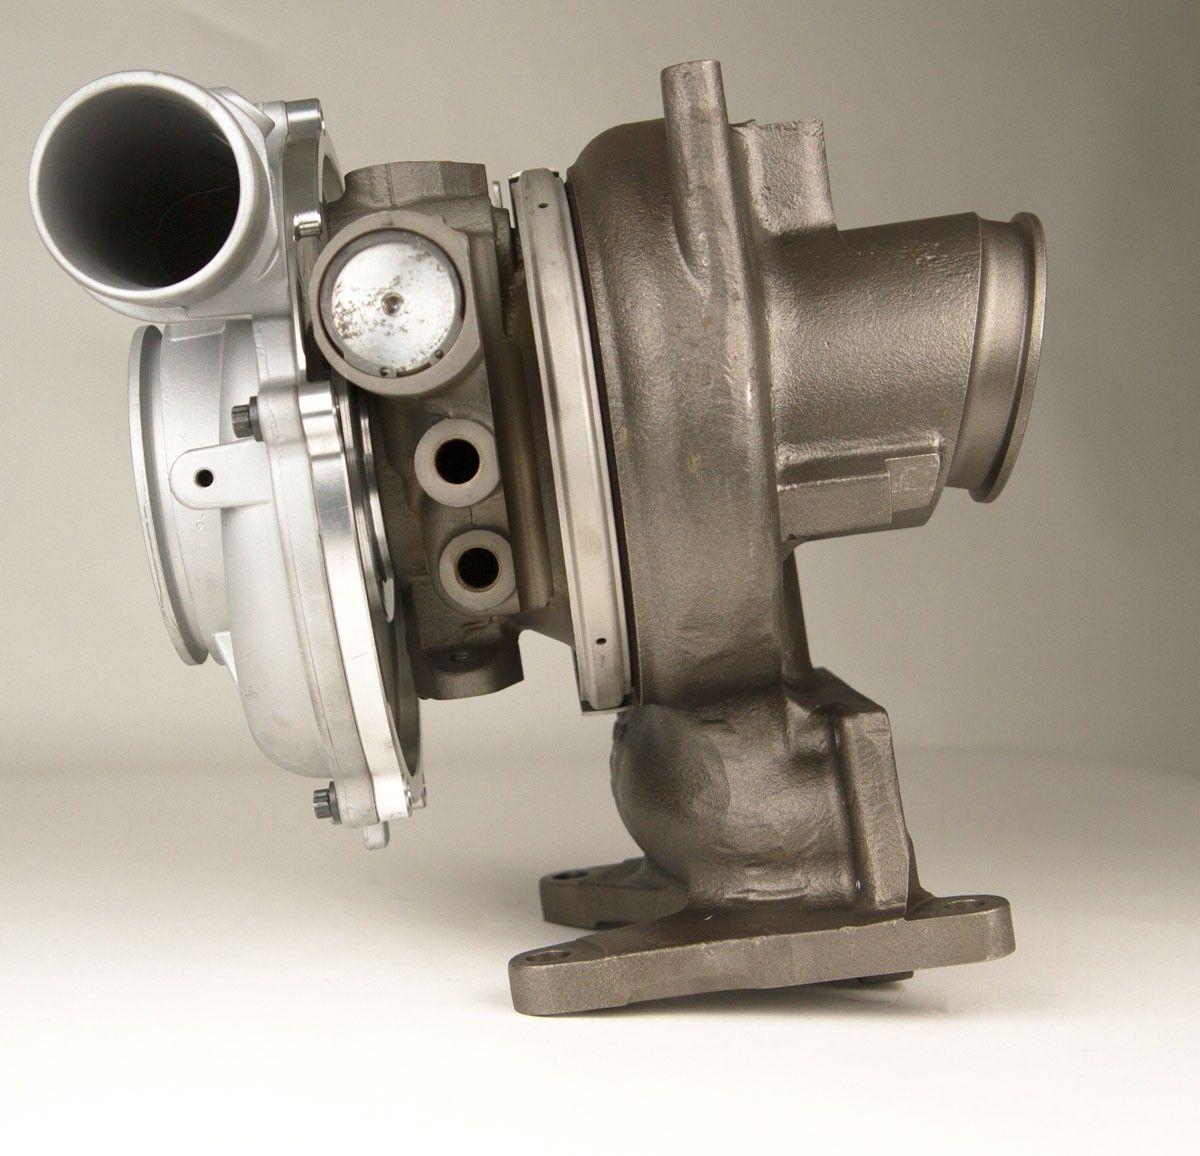 Duramax Tuner - Duramax Tuner Stealth 64 Turbocharger For 11-16 LML Duramax